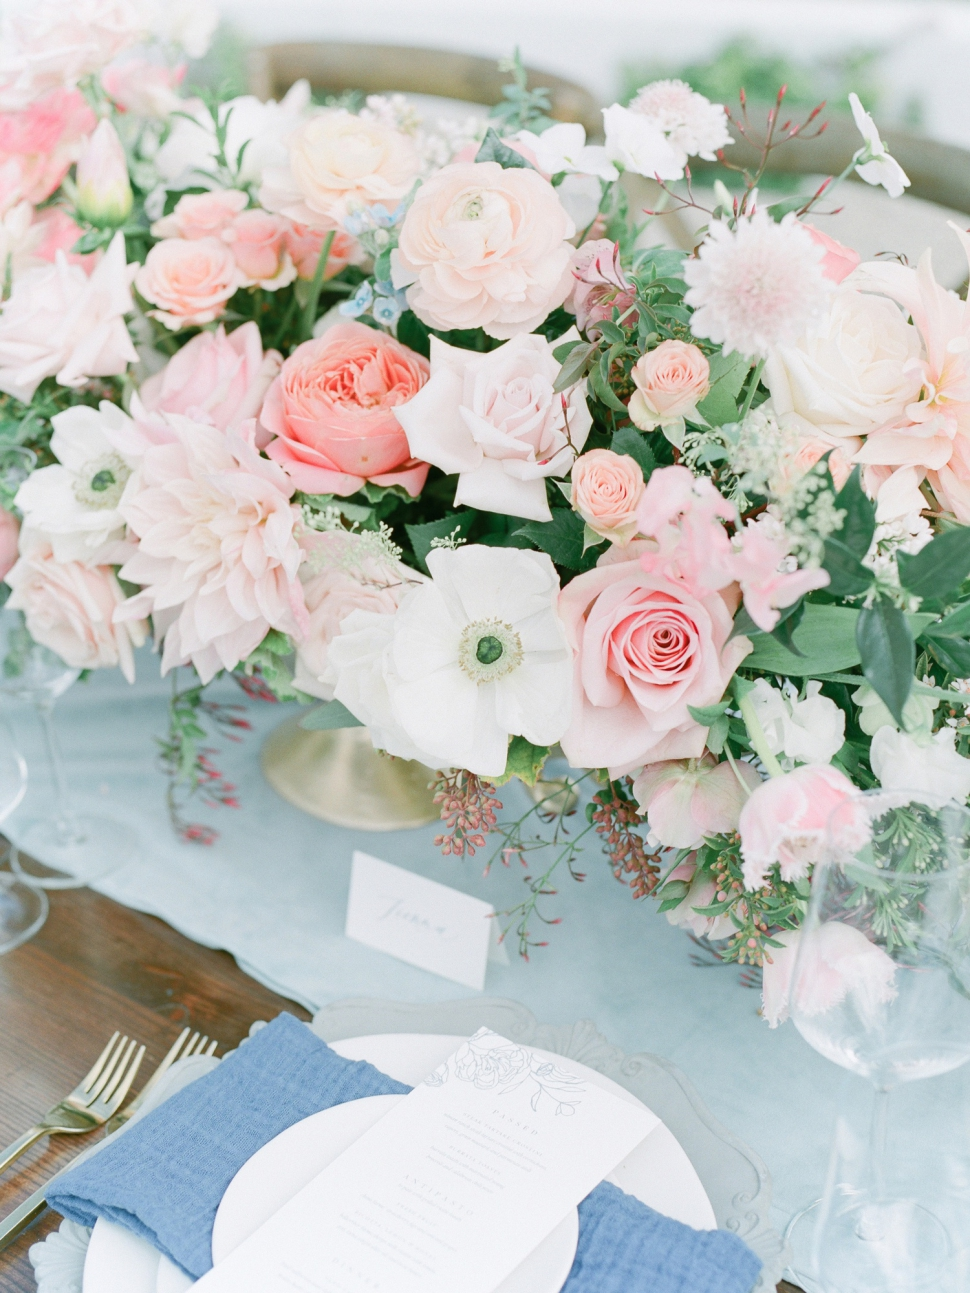 Southern-California-Malibu-Wedding-Photographer-Cassi-Claire-Deer-Creek-Ridge-Wedding_03.jpg